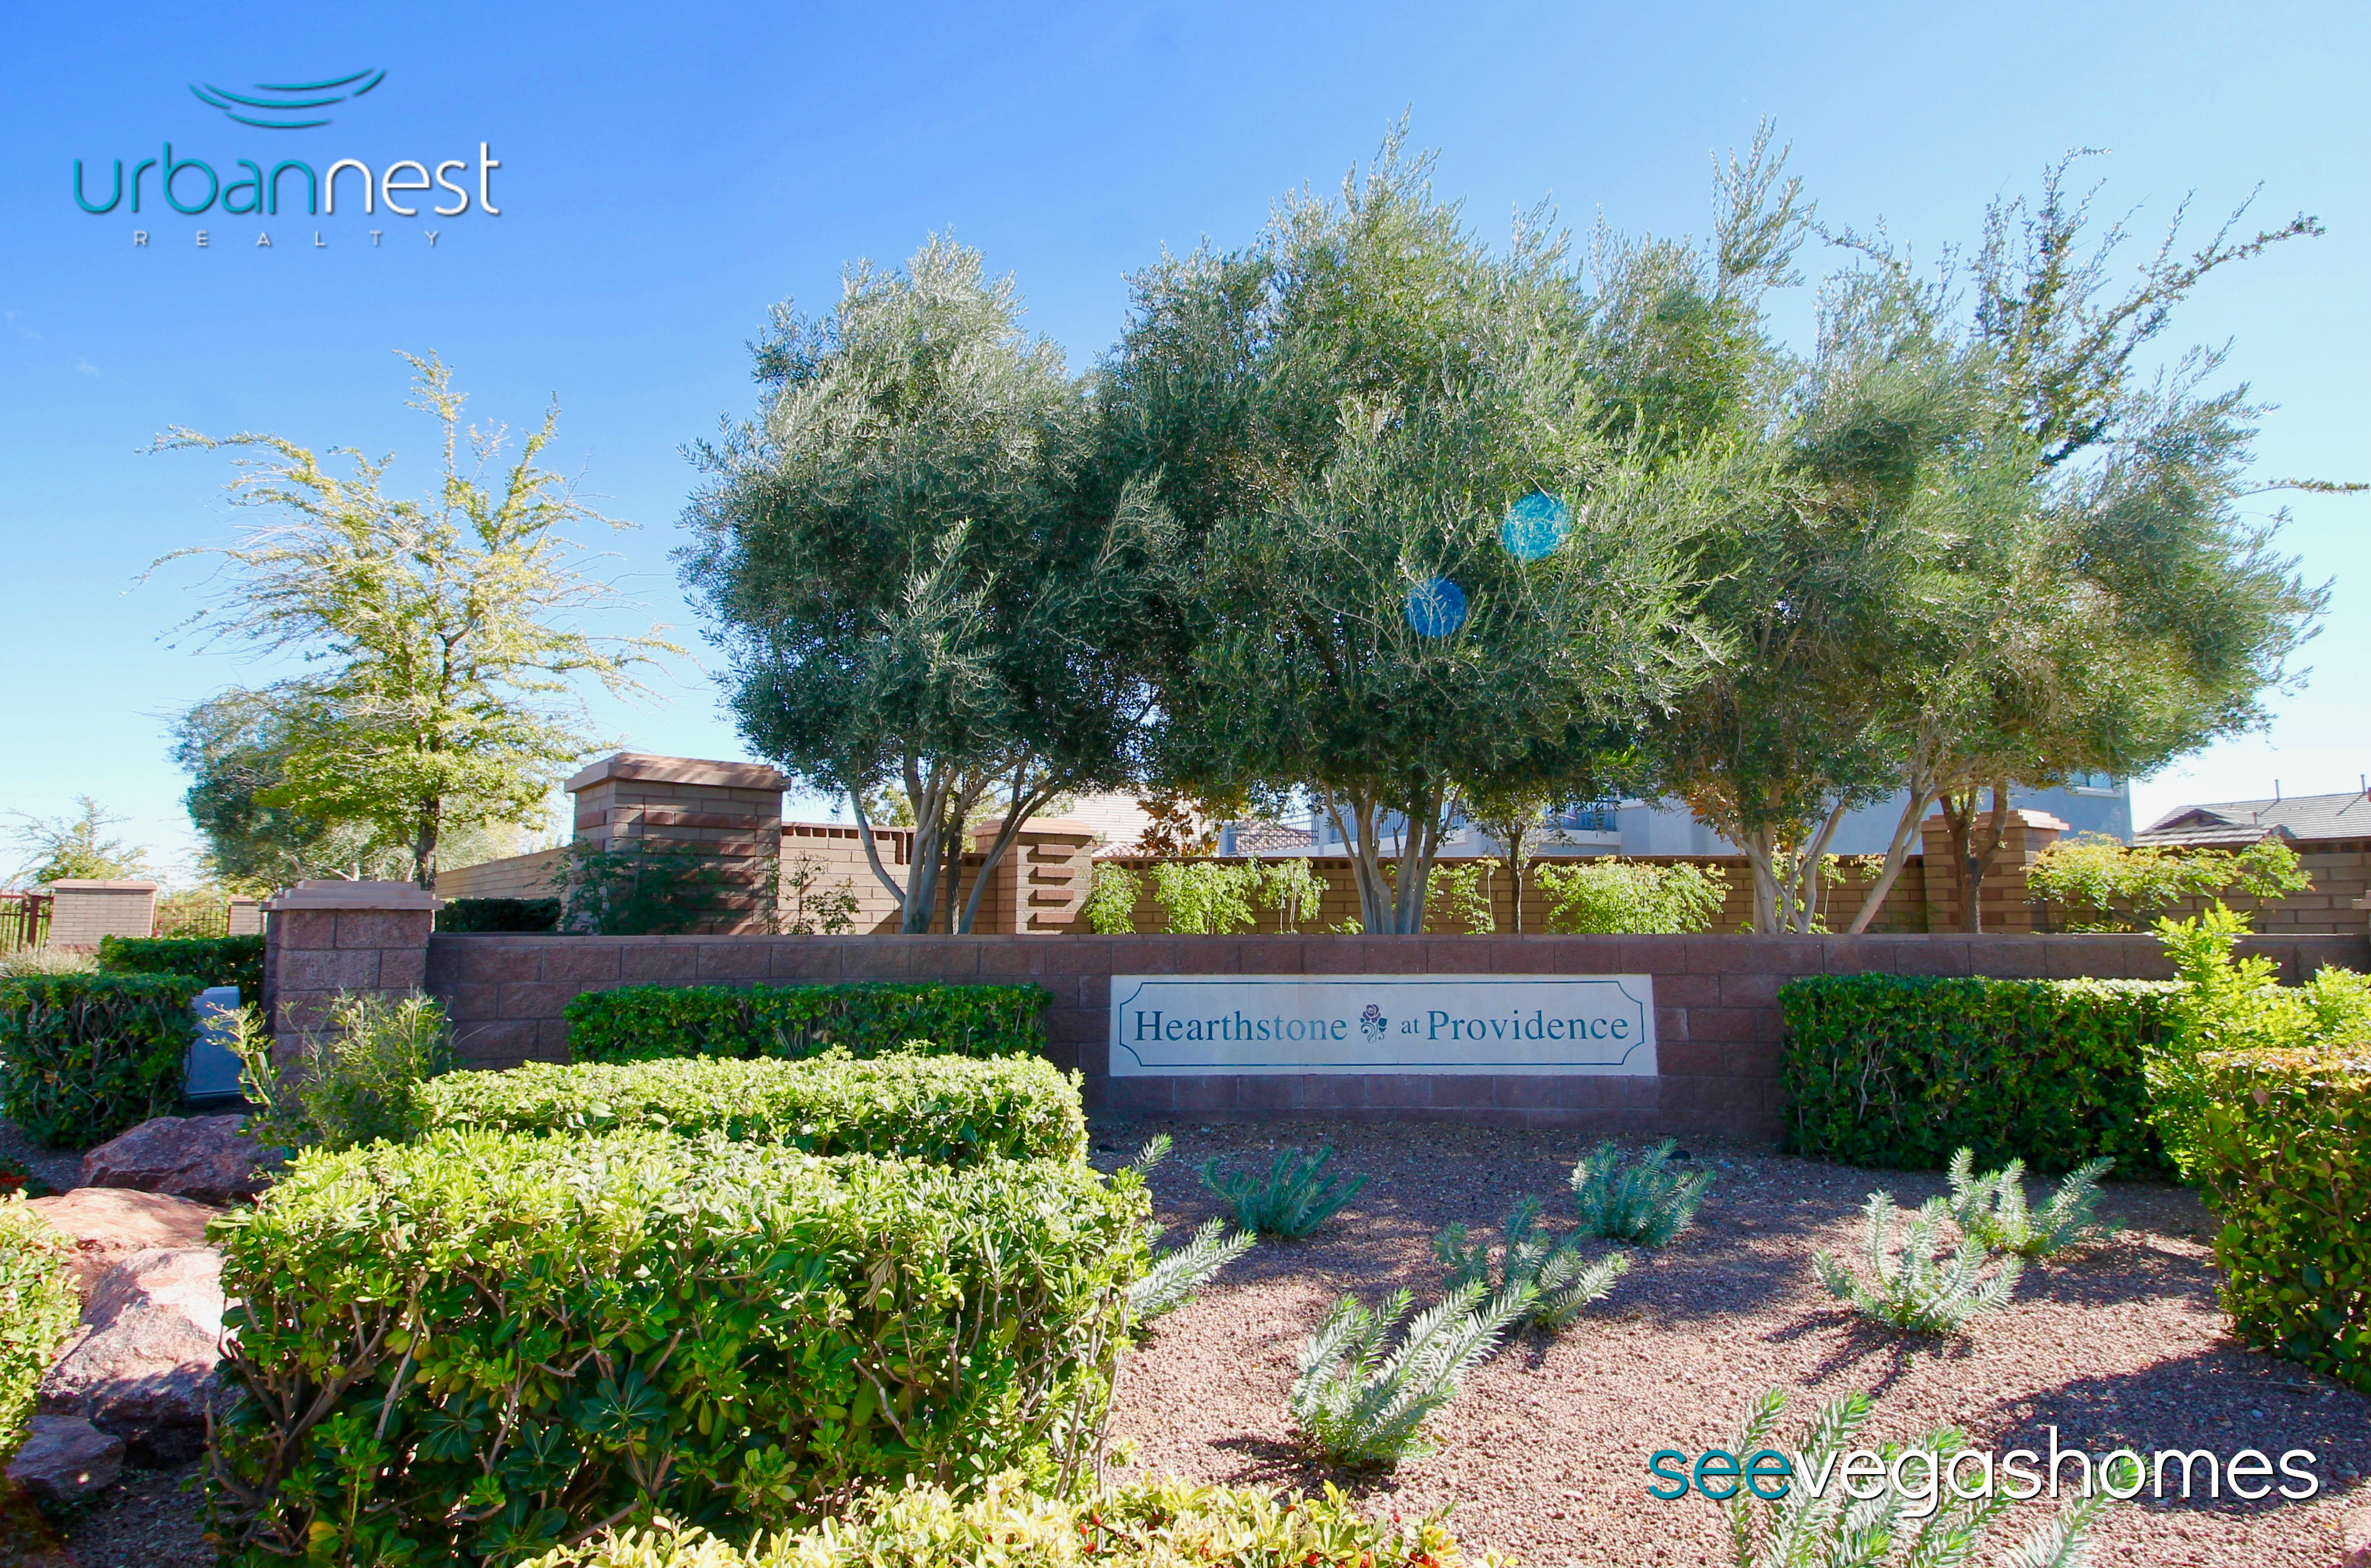 Hearthstone_at_Providence_Las_Vegas_NV_89166_SeeVegasHomes